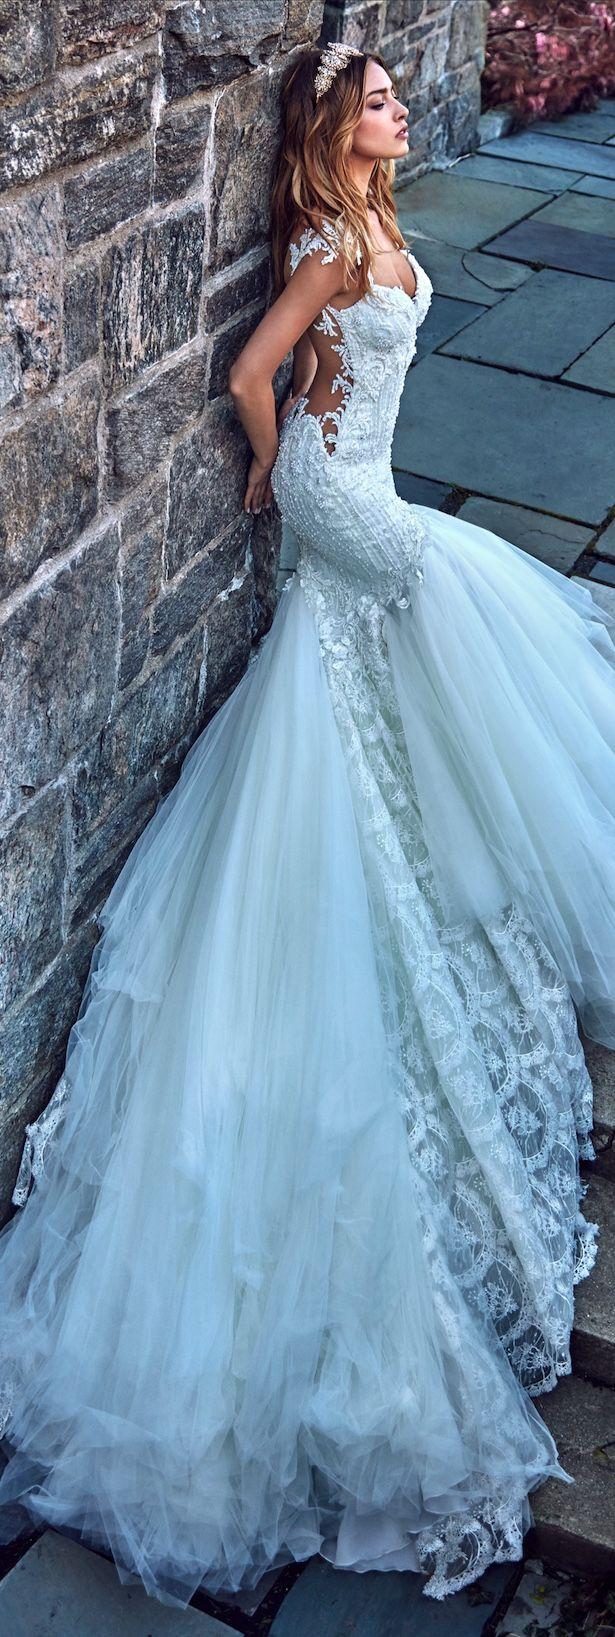 Galia Lahav Spring 2017 Collection - Le Secret Royal - Belle The Magazine